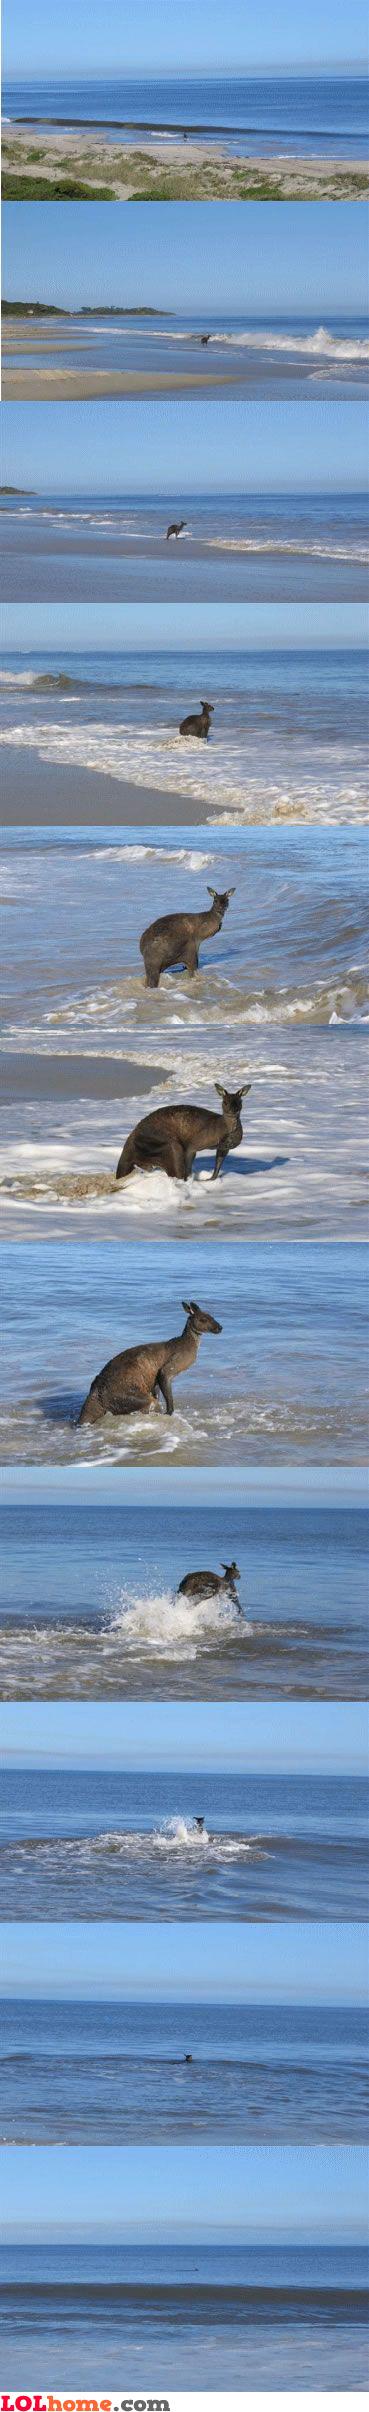 Suicidal kangaroo